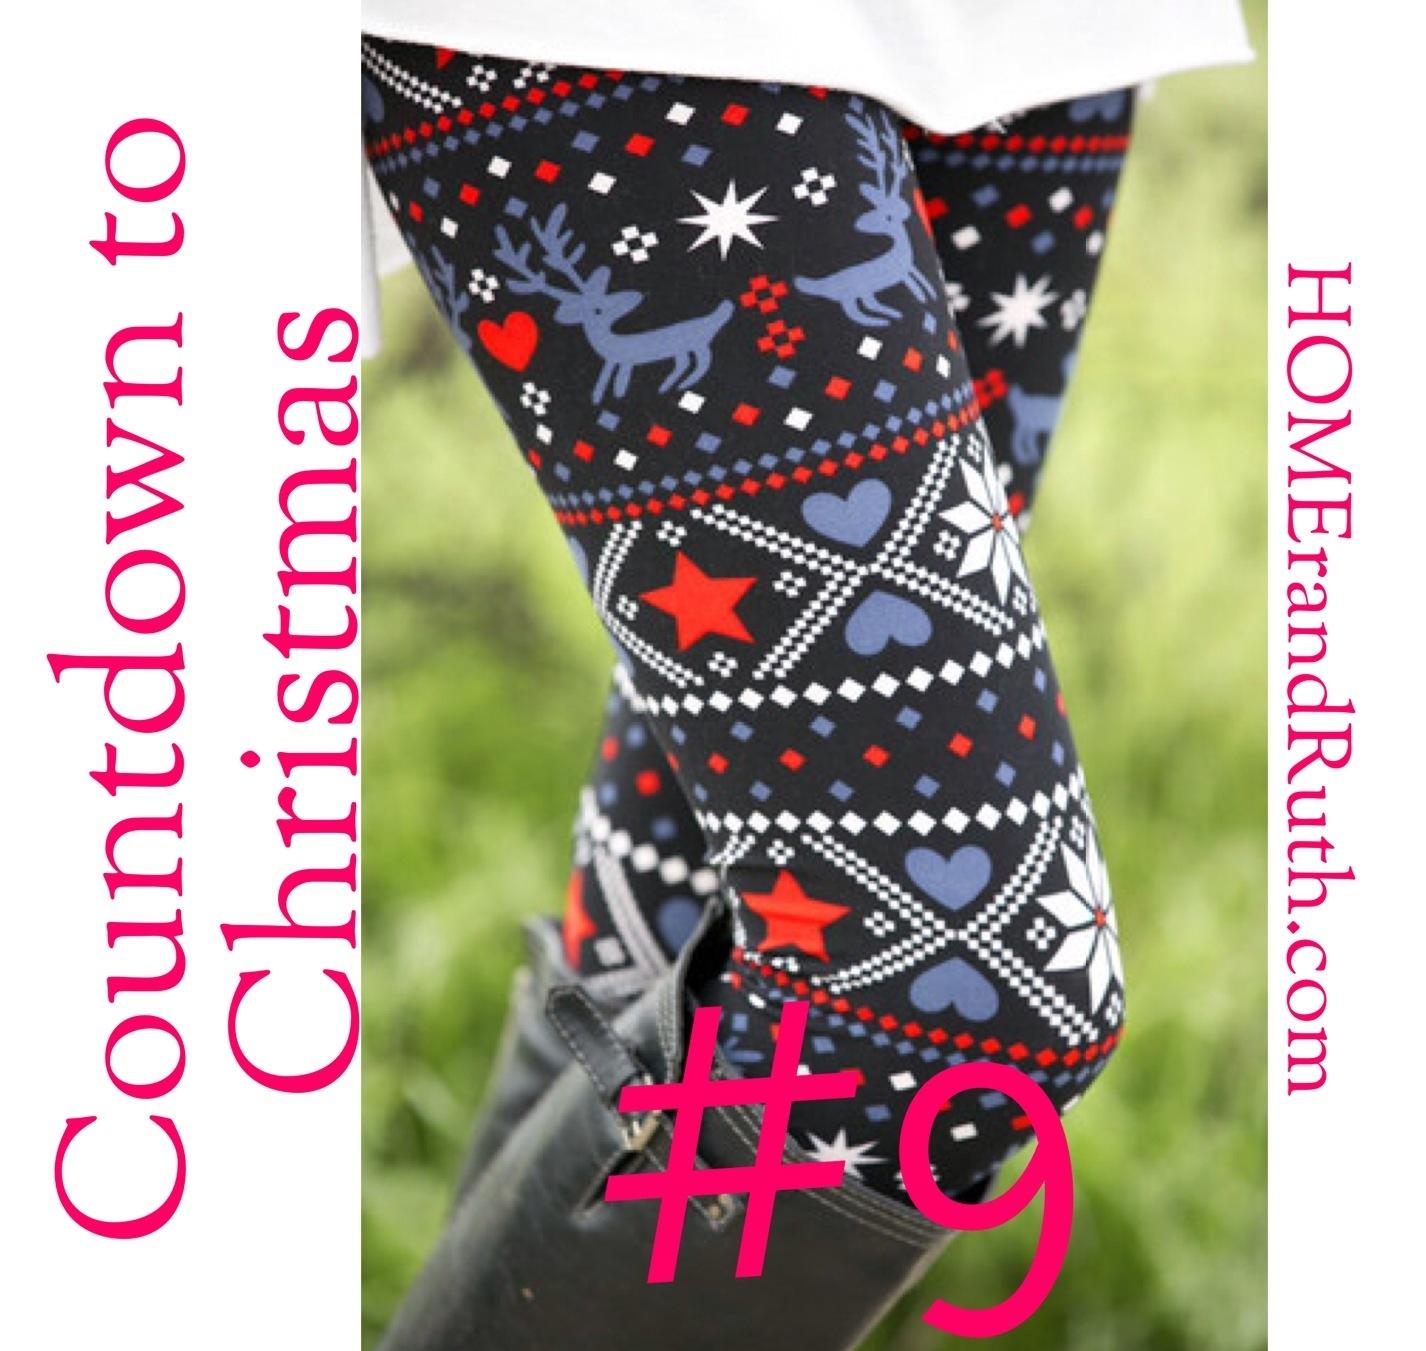 25 Days of Christmas Countdown #9 on HOMErandRuth.com